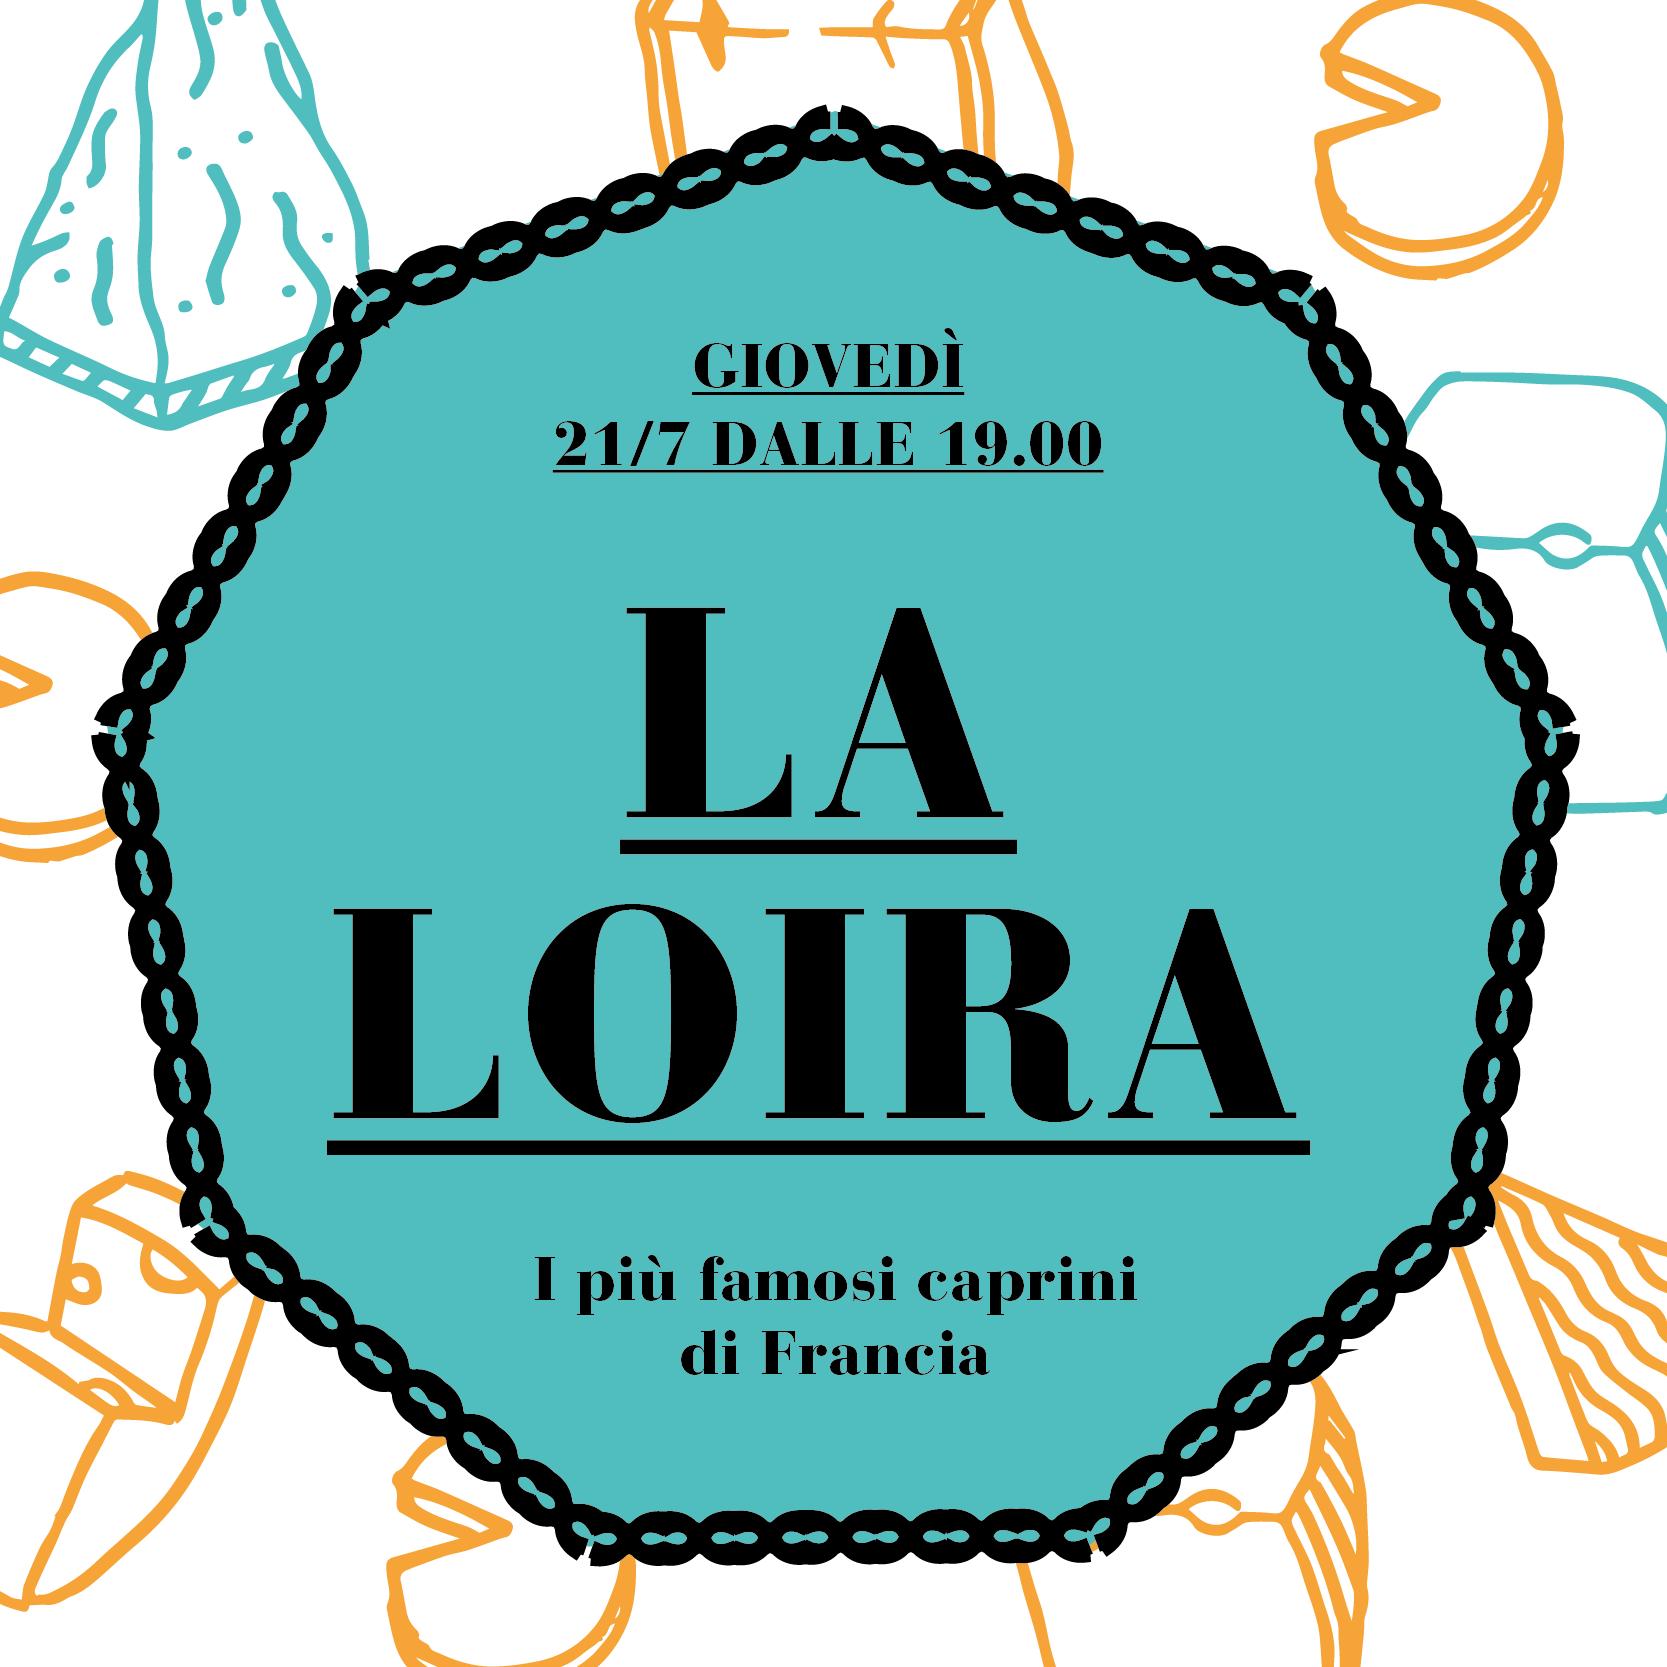 laloira_post-01